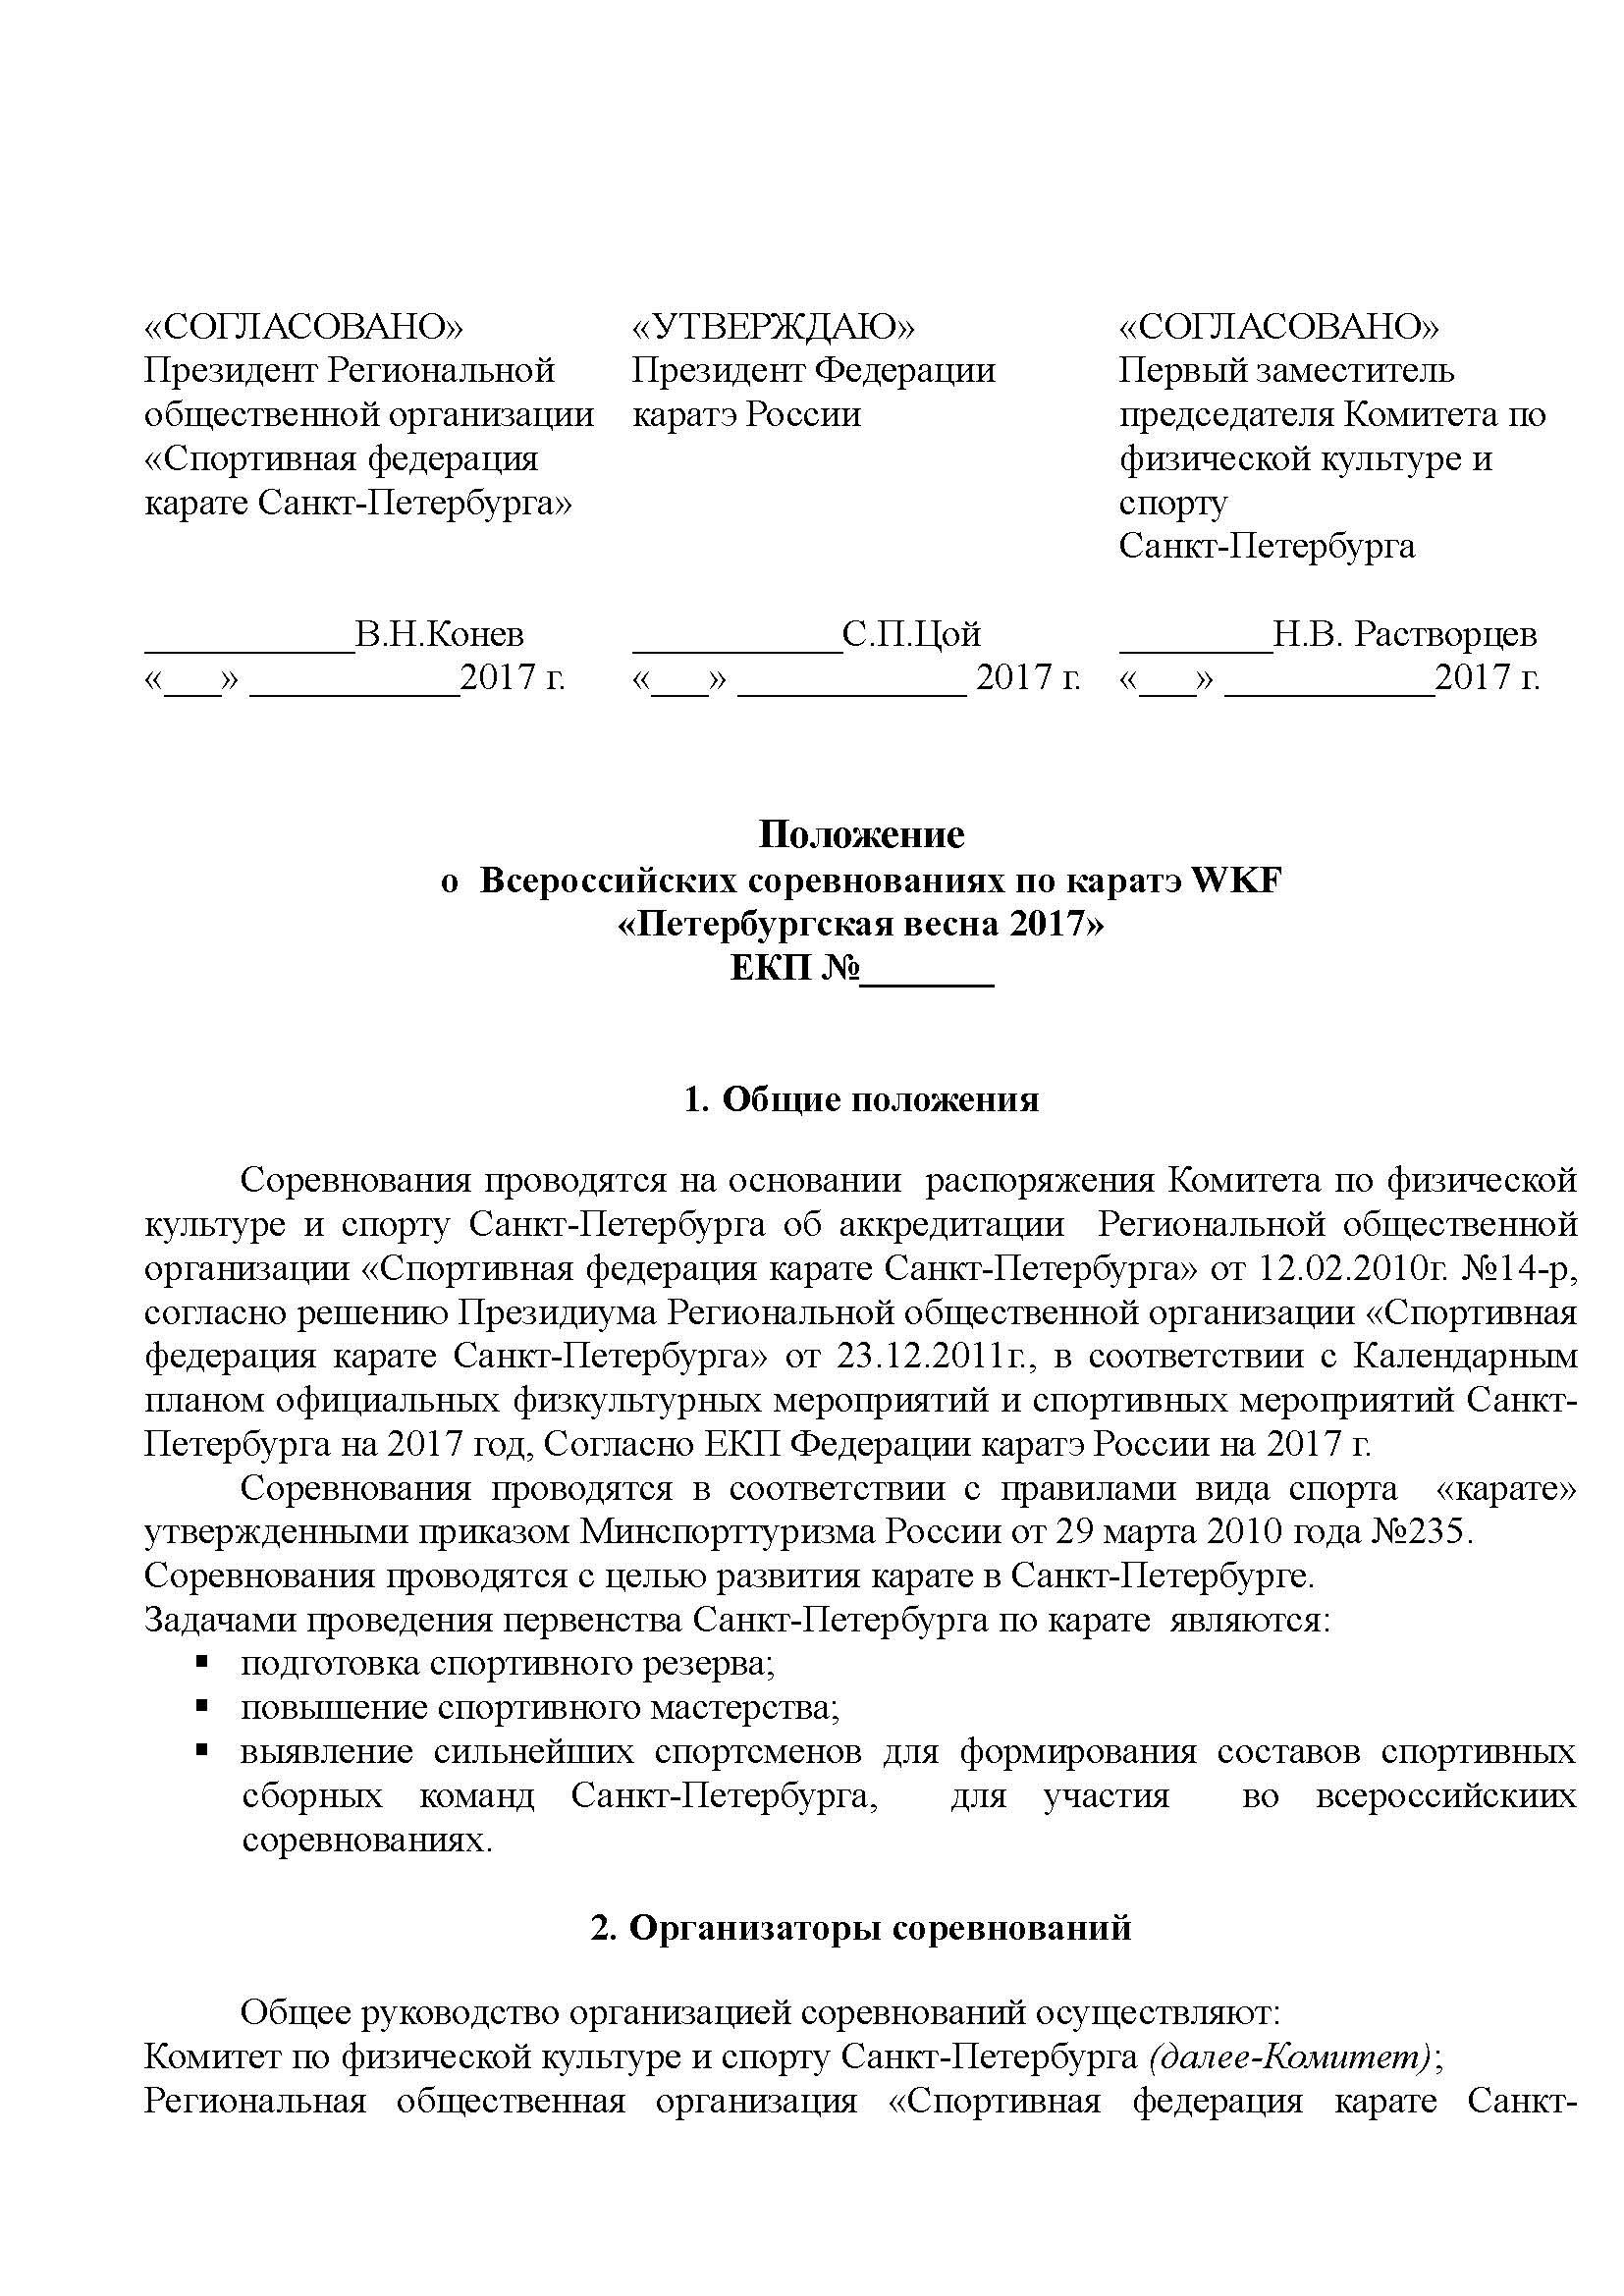 PS-2017-001-ВС_Страница_1